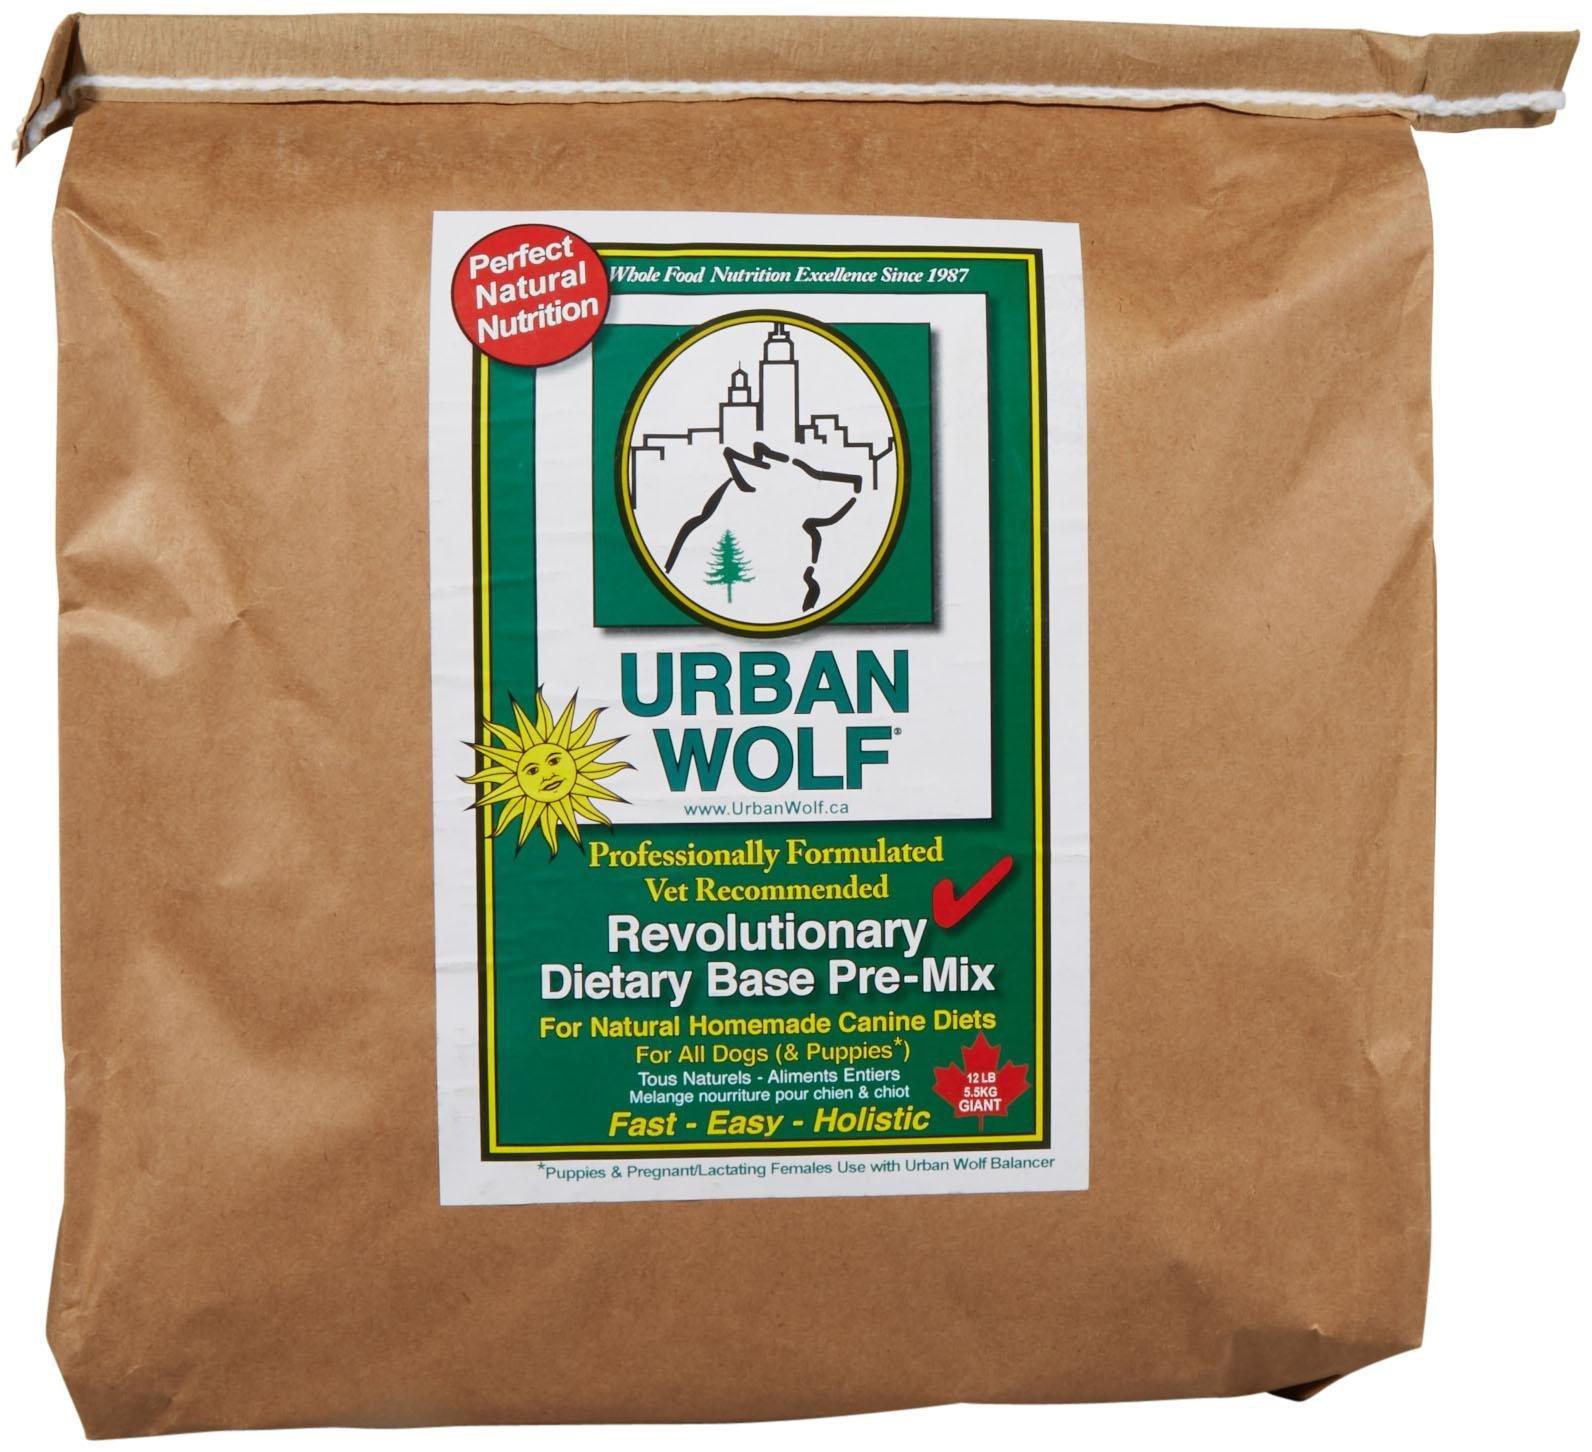 Urban Wolf Dog Food Mix - Dietary Base Mix - 12 Lb